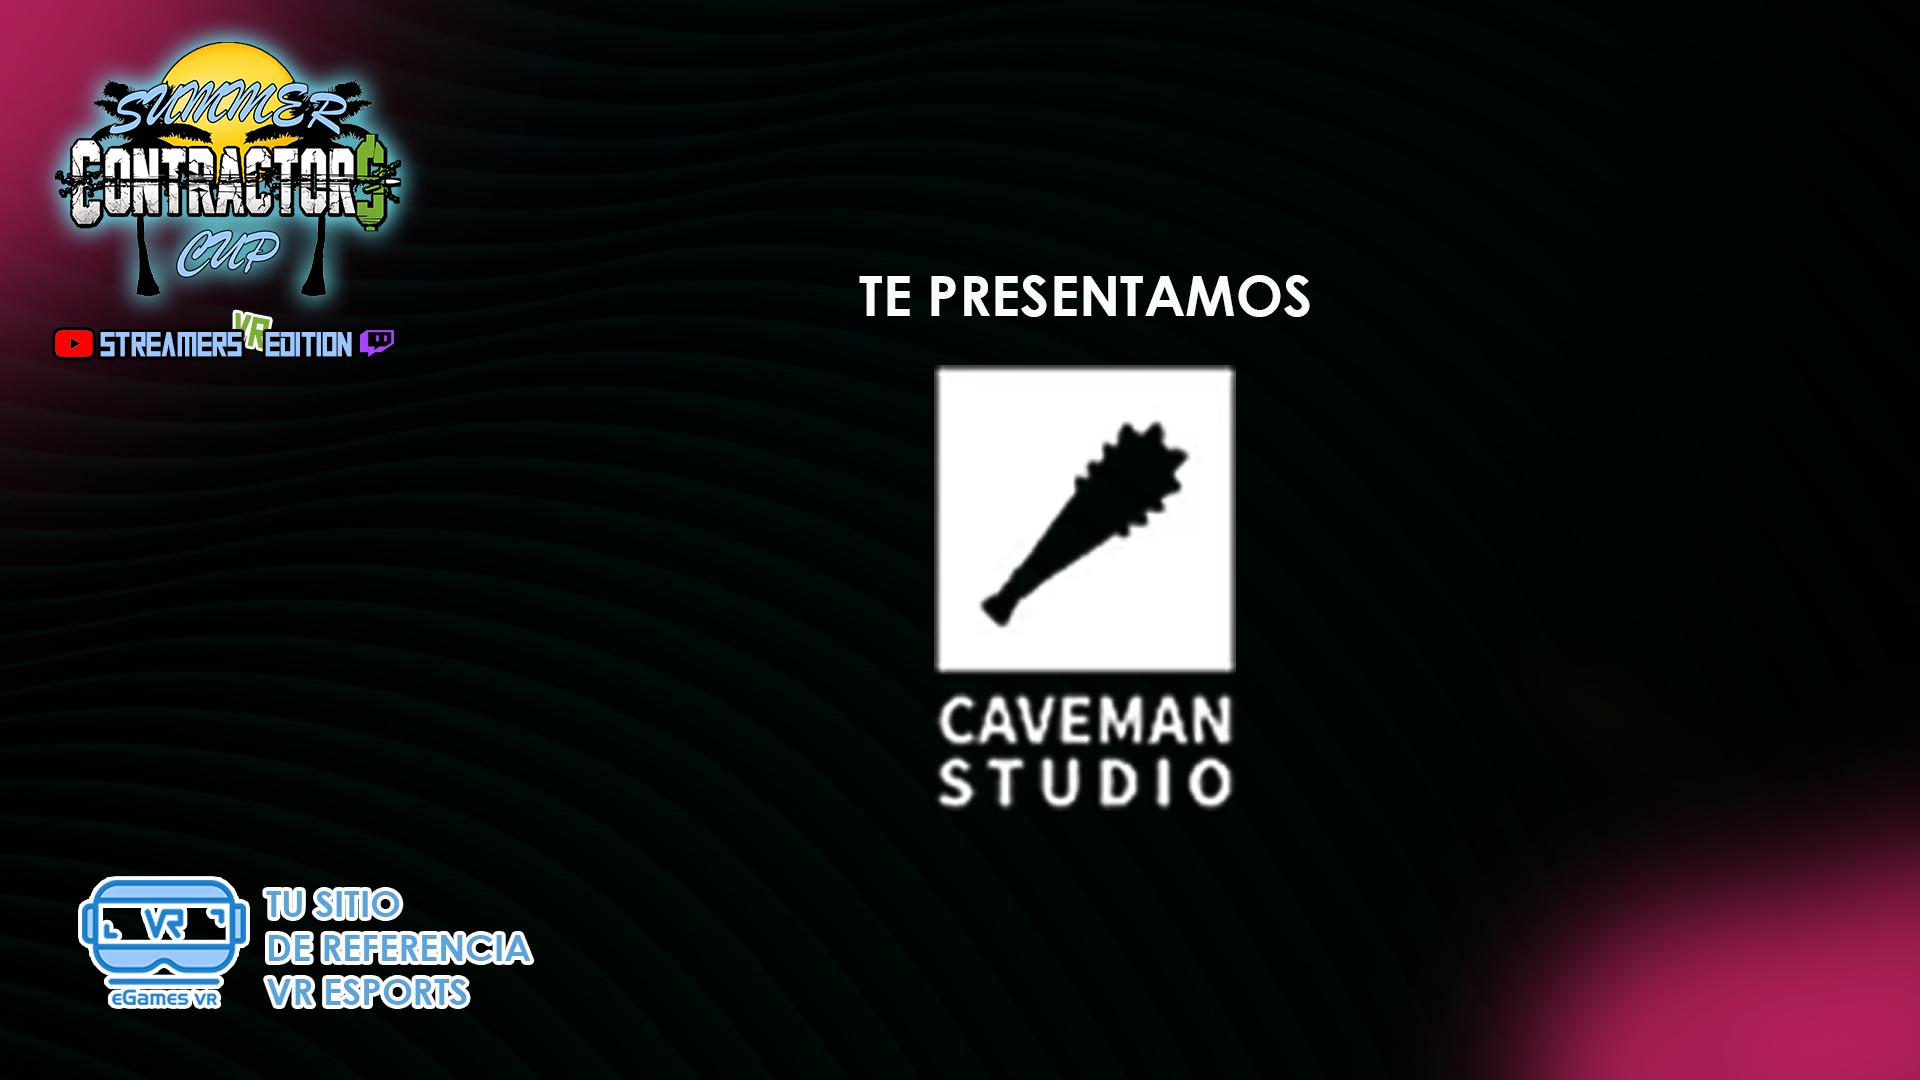 CAVEMAN STUDIO